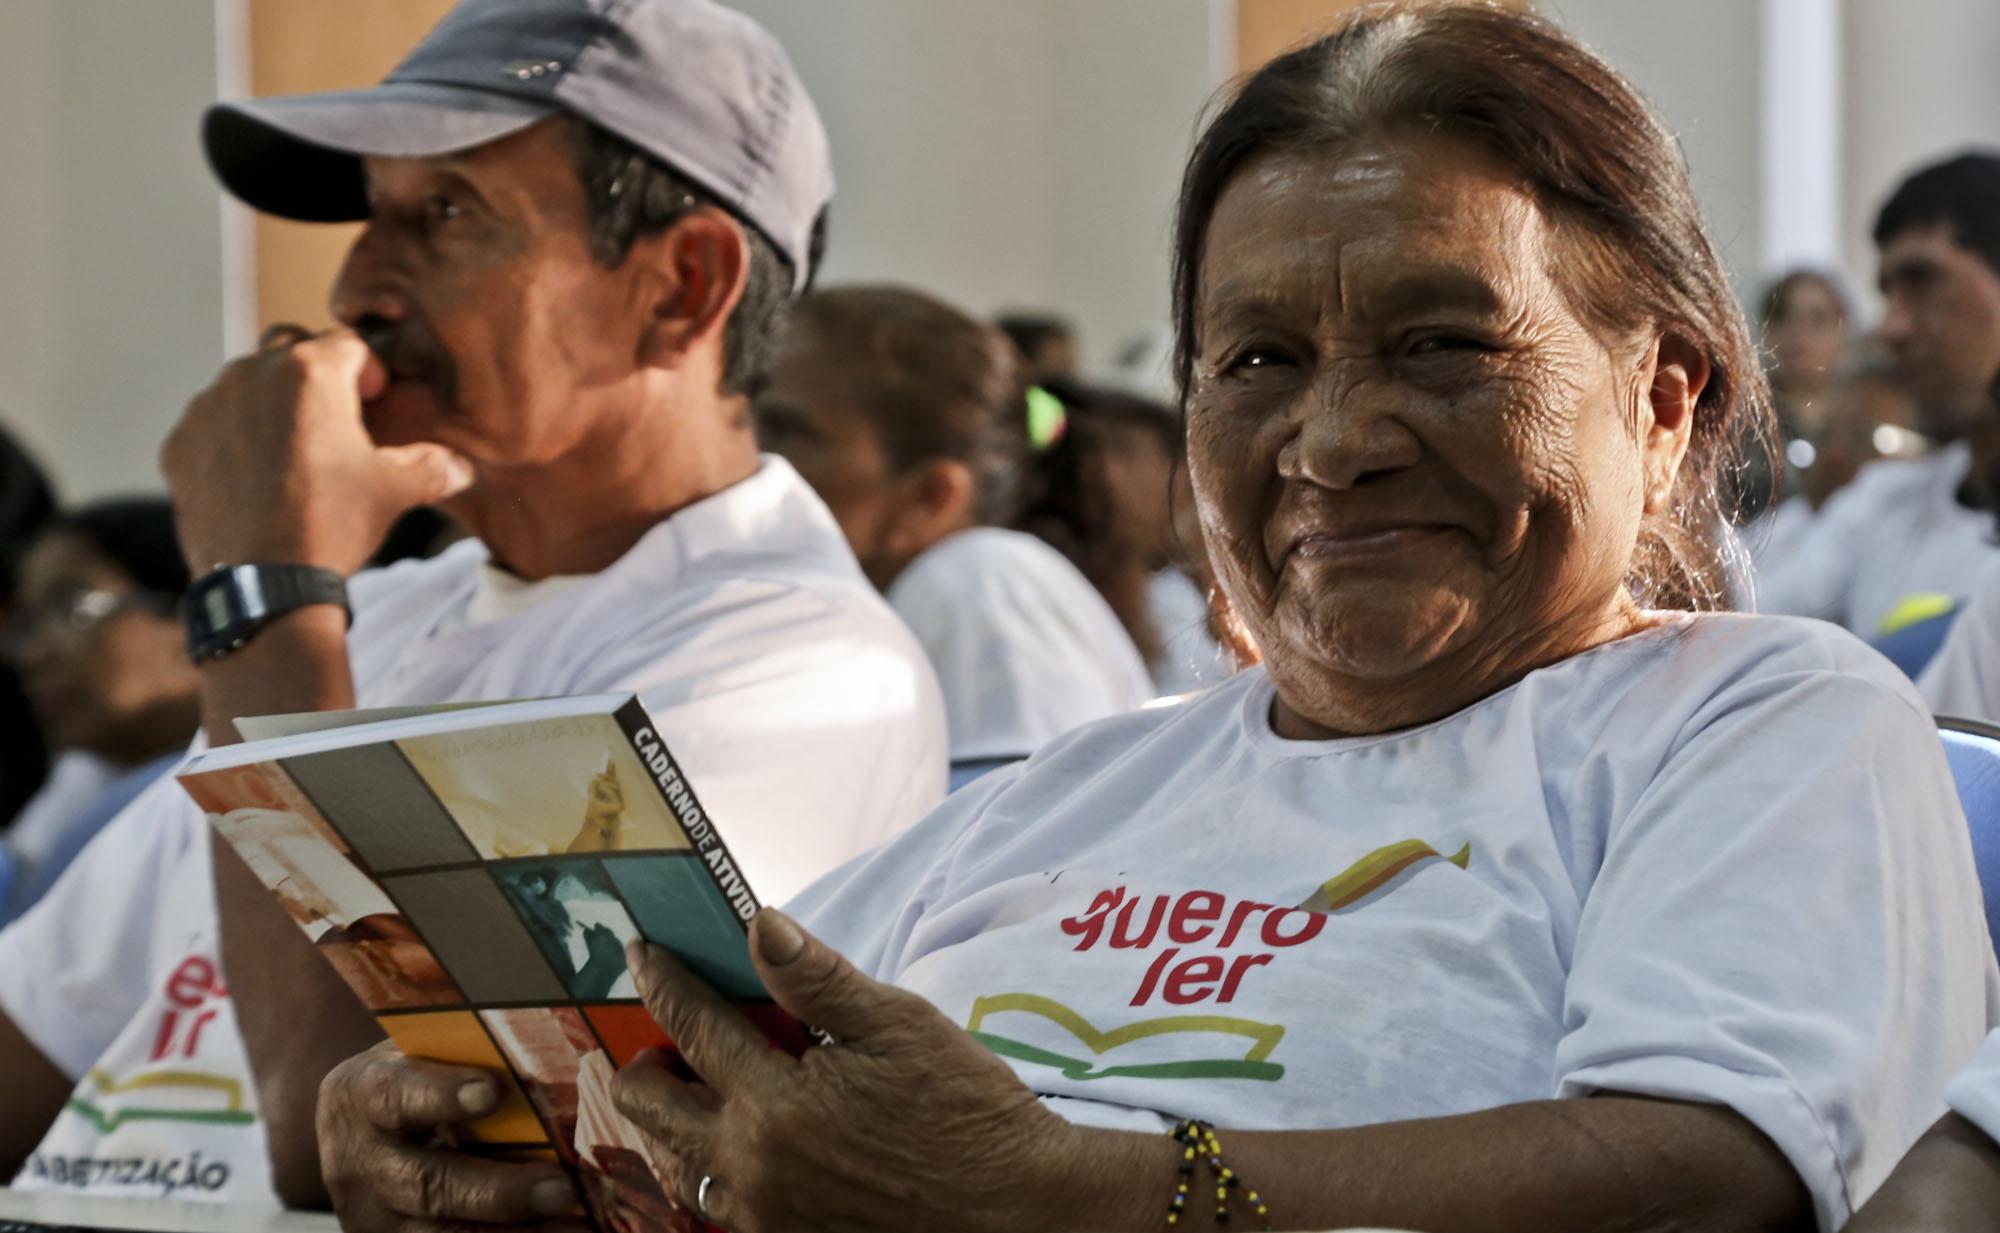 Brasiléia e Epitaciolândia entram na reta final do analfabetismo